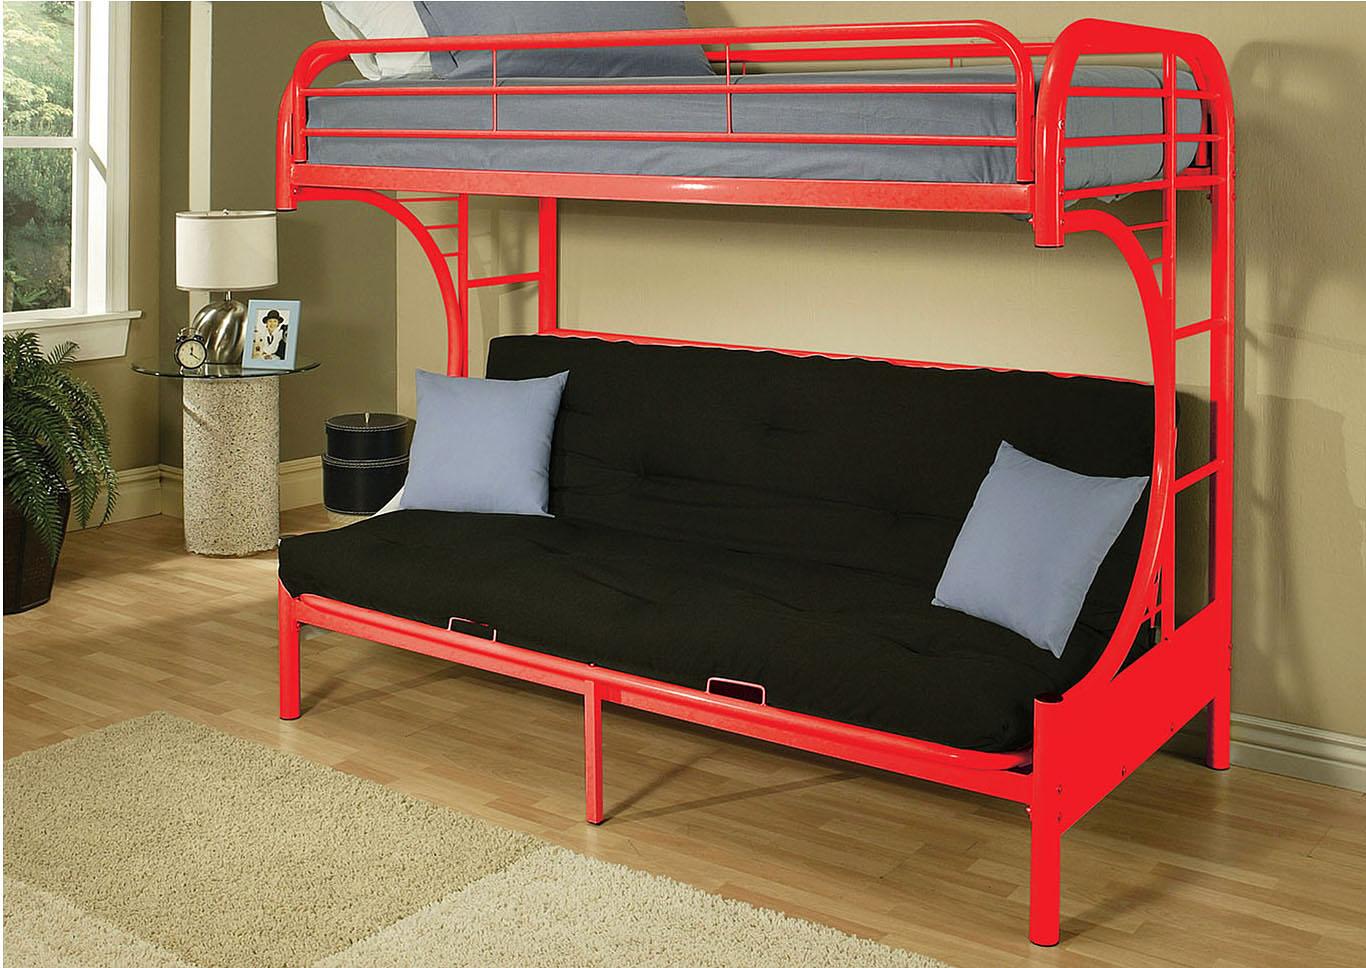 new arrival a98f1 27d62 Goree's Furniture - Opelika, AL Eclipse Red Twin/Full/Futon ...